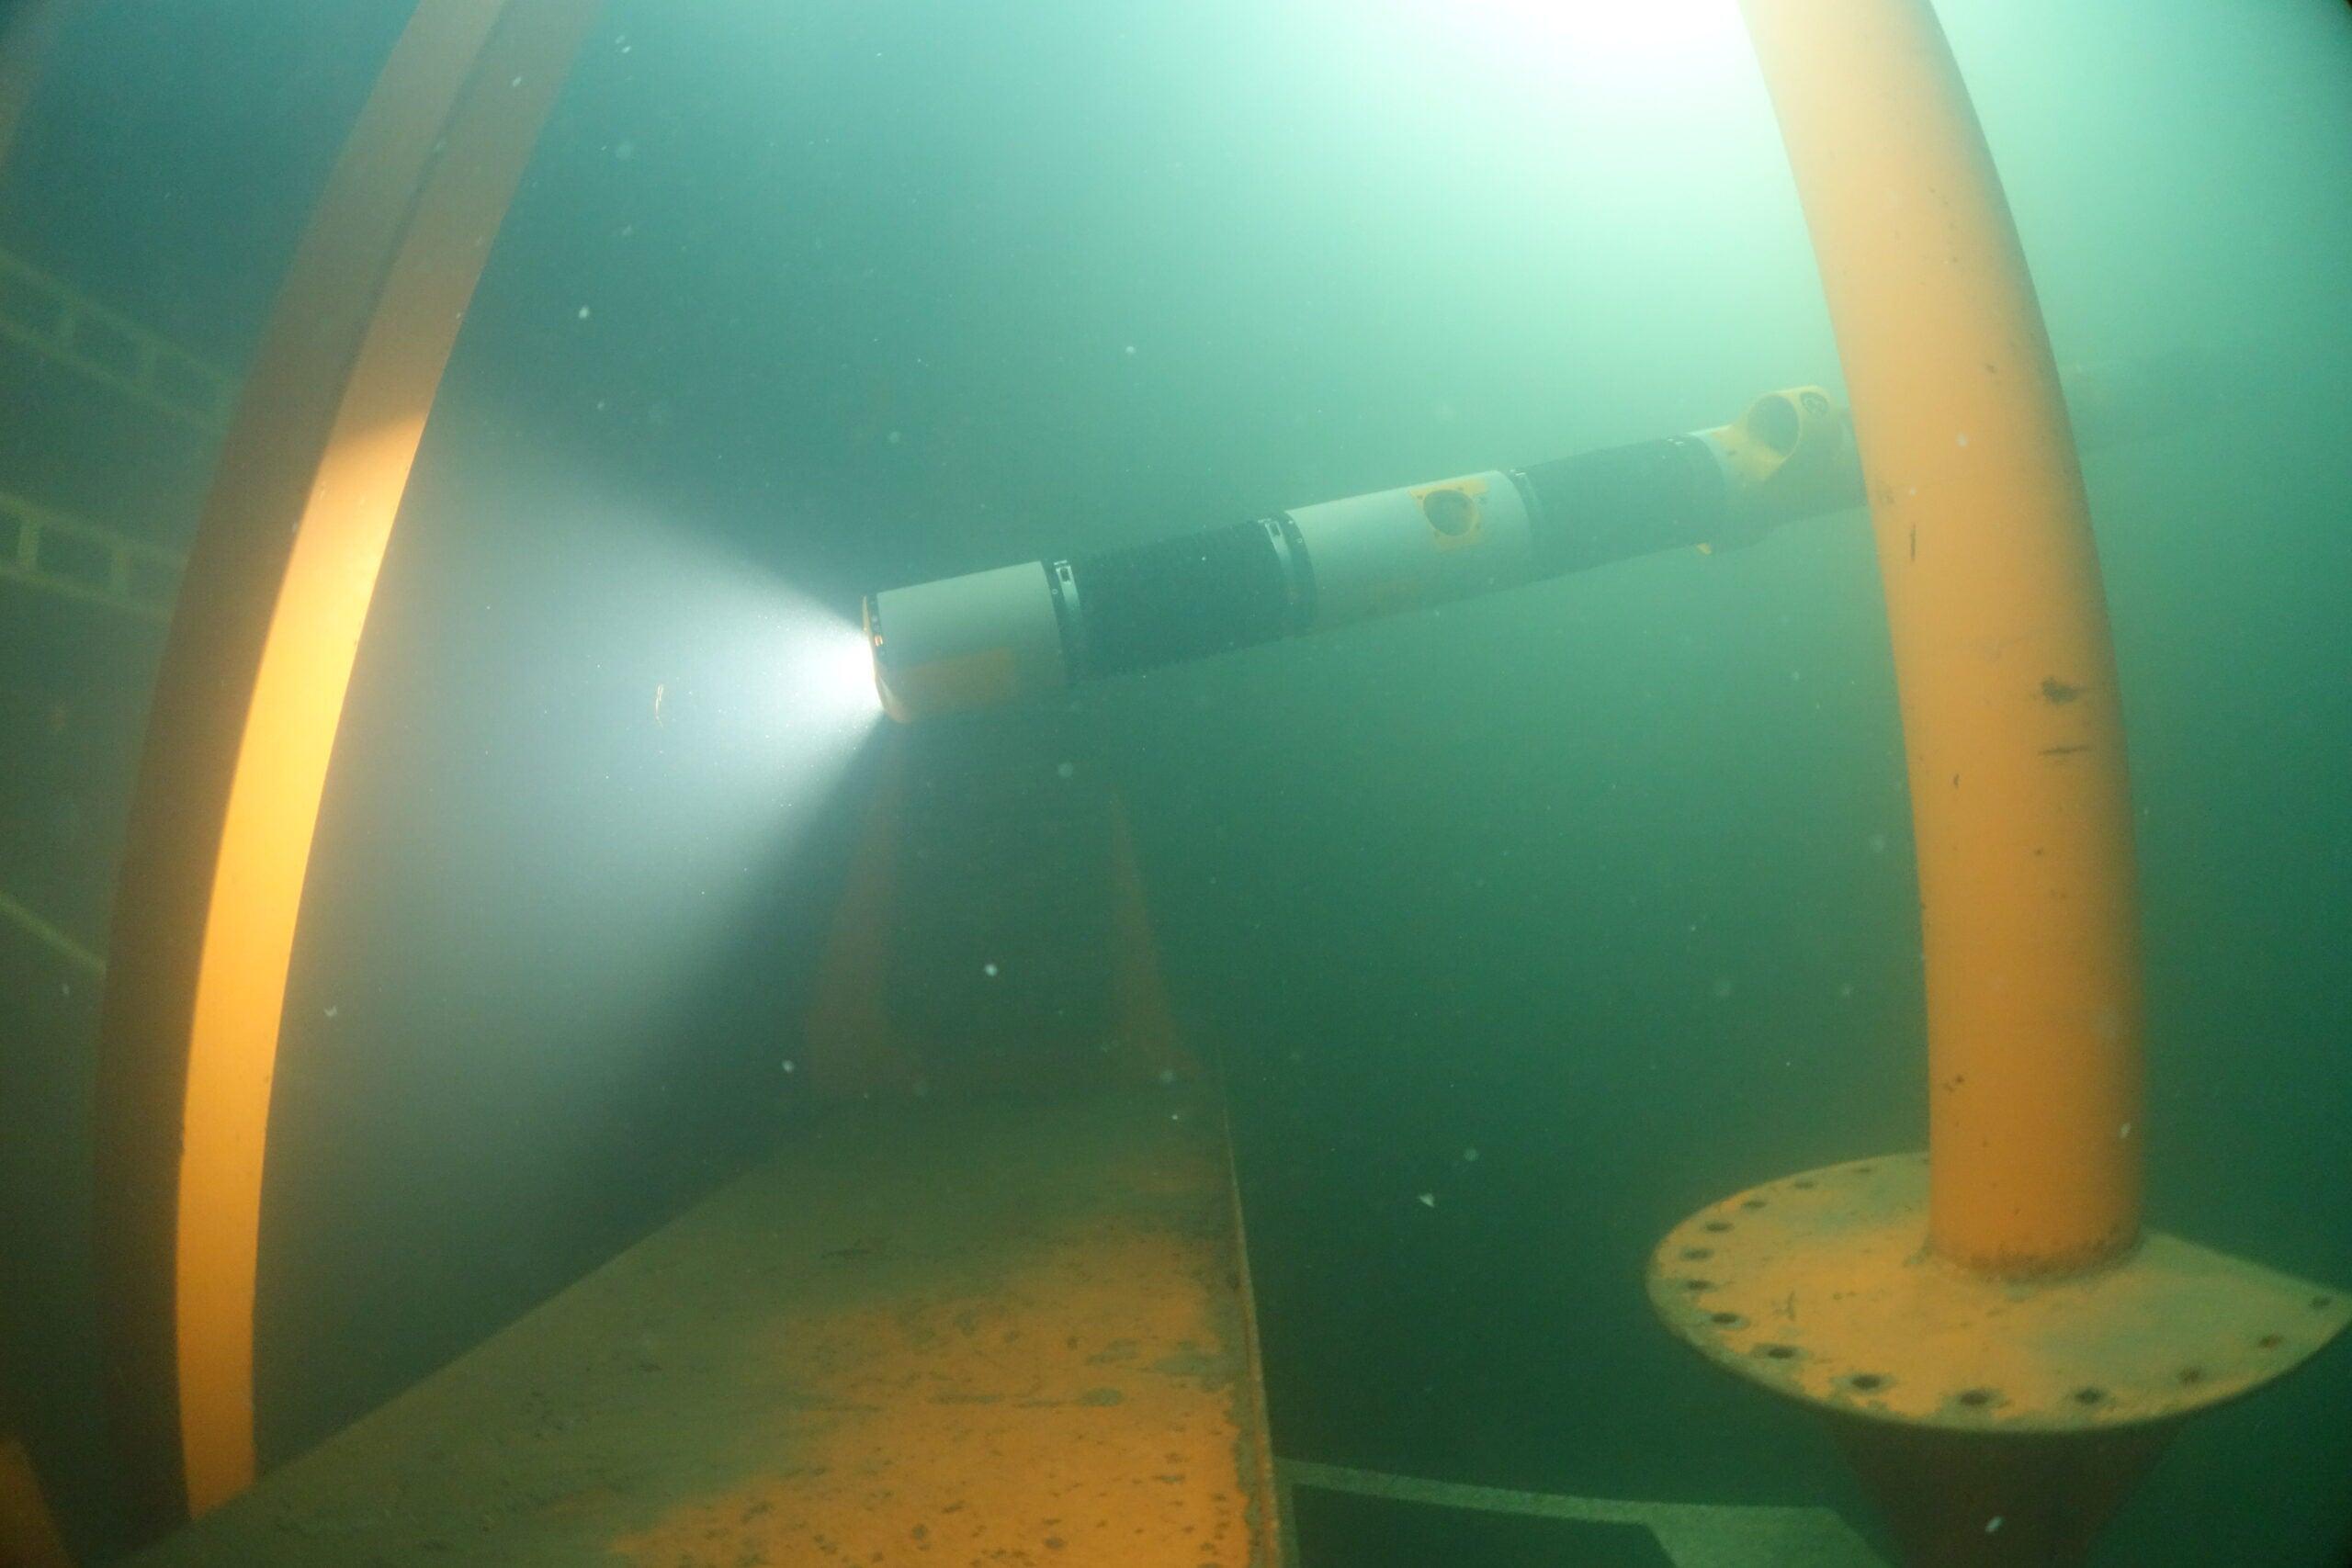 Eelume robot explores a test rig